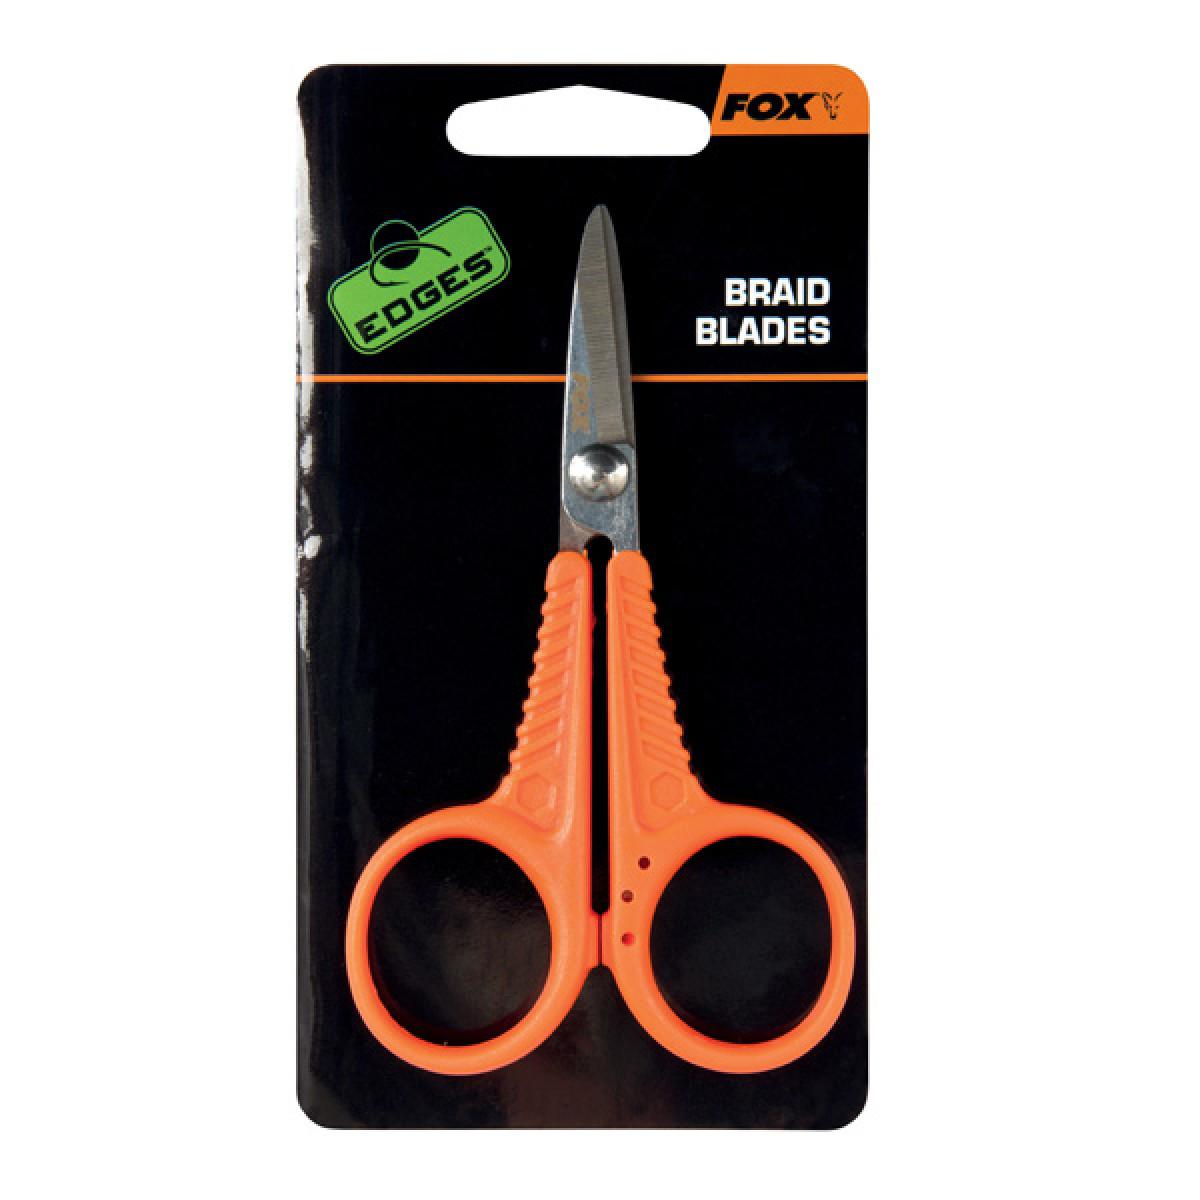 Braid Blades